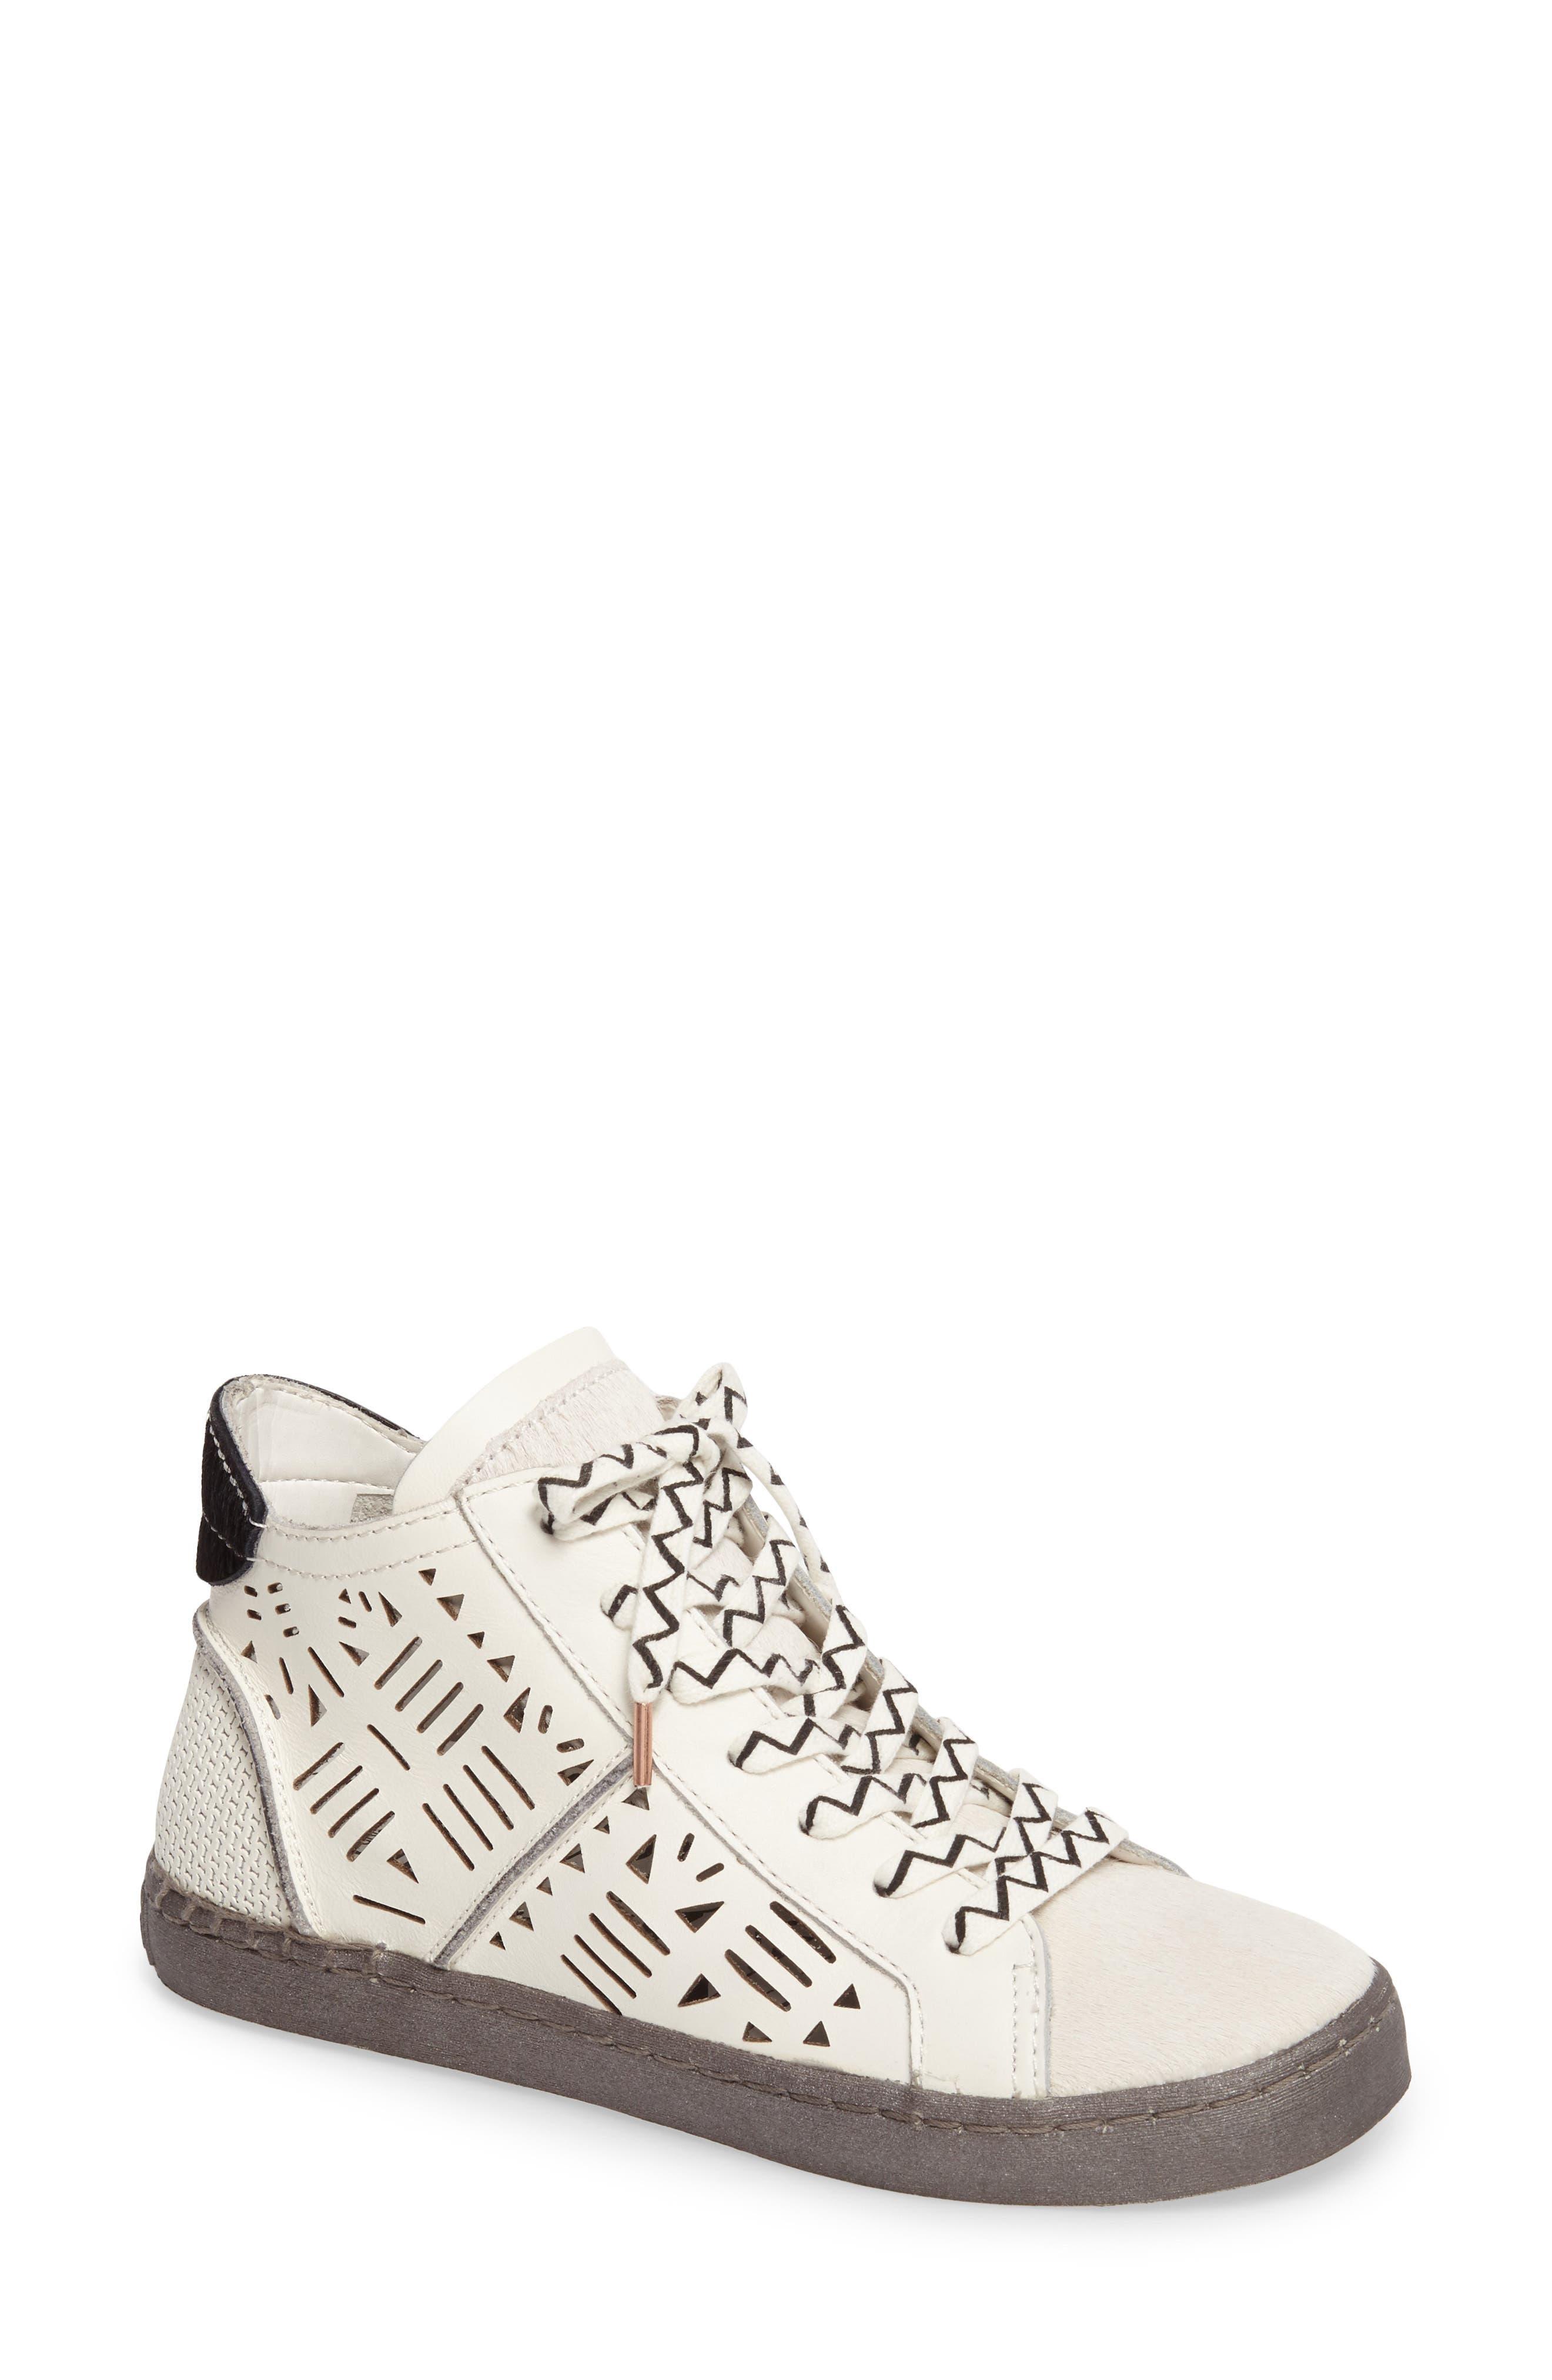 Dolce Vita Zeus Genuine Calf Hair Sneaker (Women)